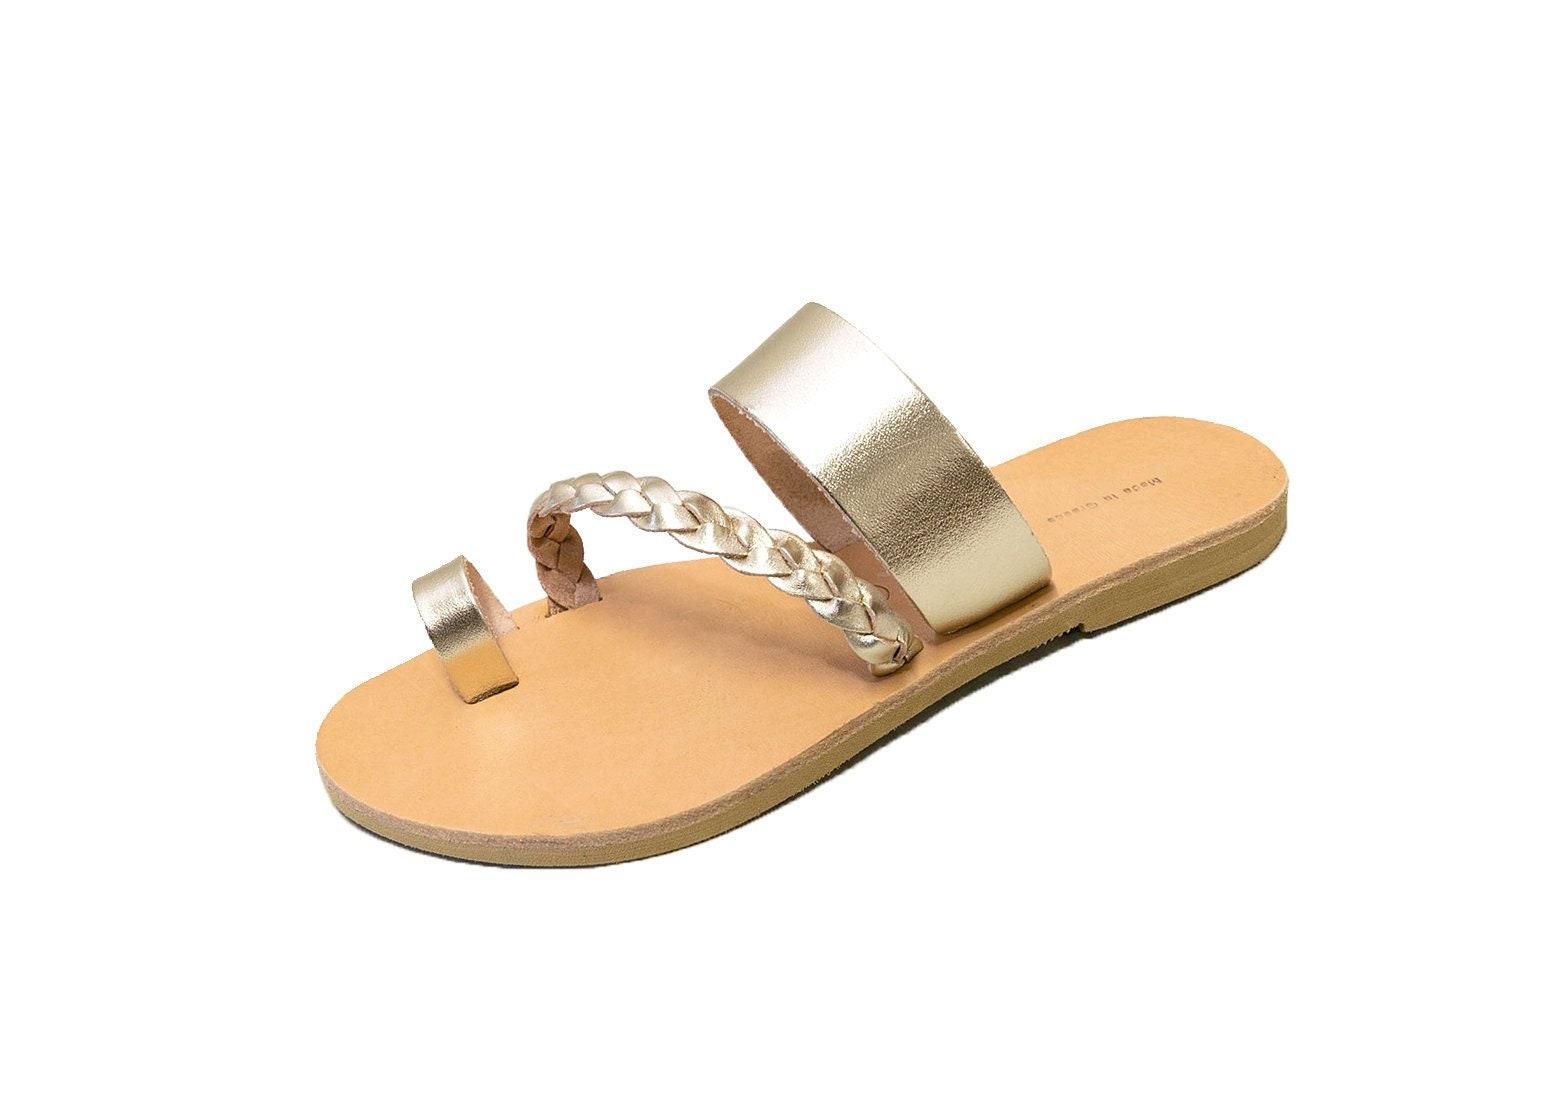 b0a40da7758ca Gold Wedding Sandals - Handmade Greek Leather Sandals - Toe Ring - Metallic  Sandals - Ancient Greek Style - Rose Gold Sandals - Bridesmaids